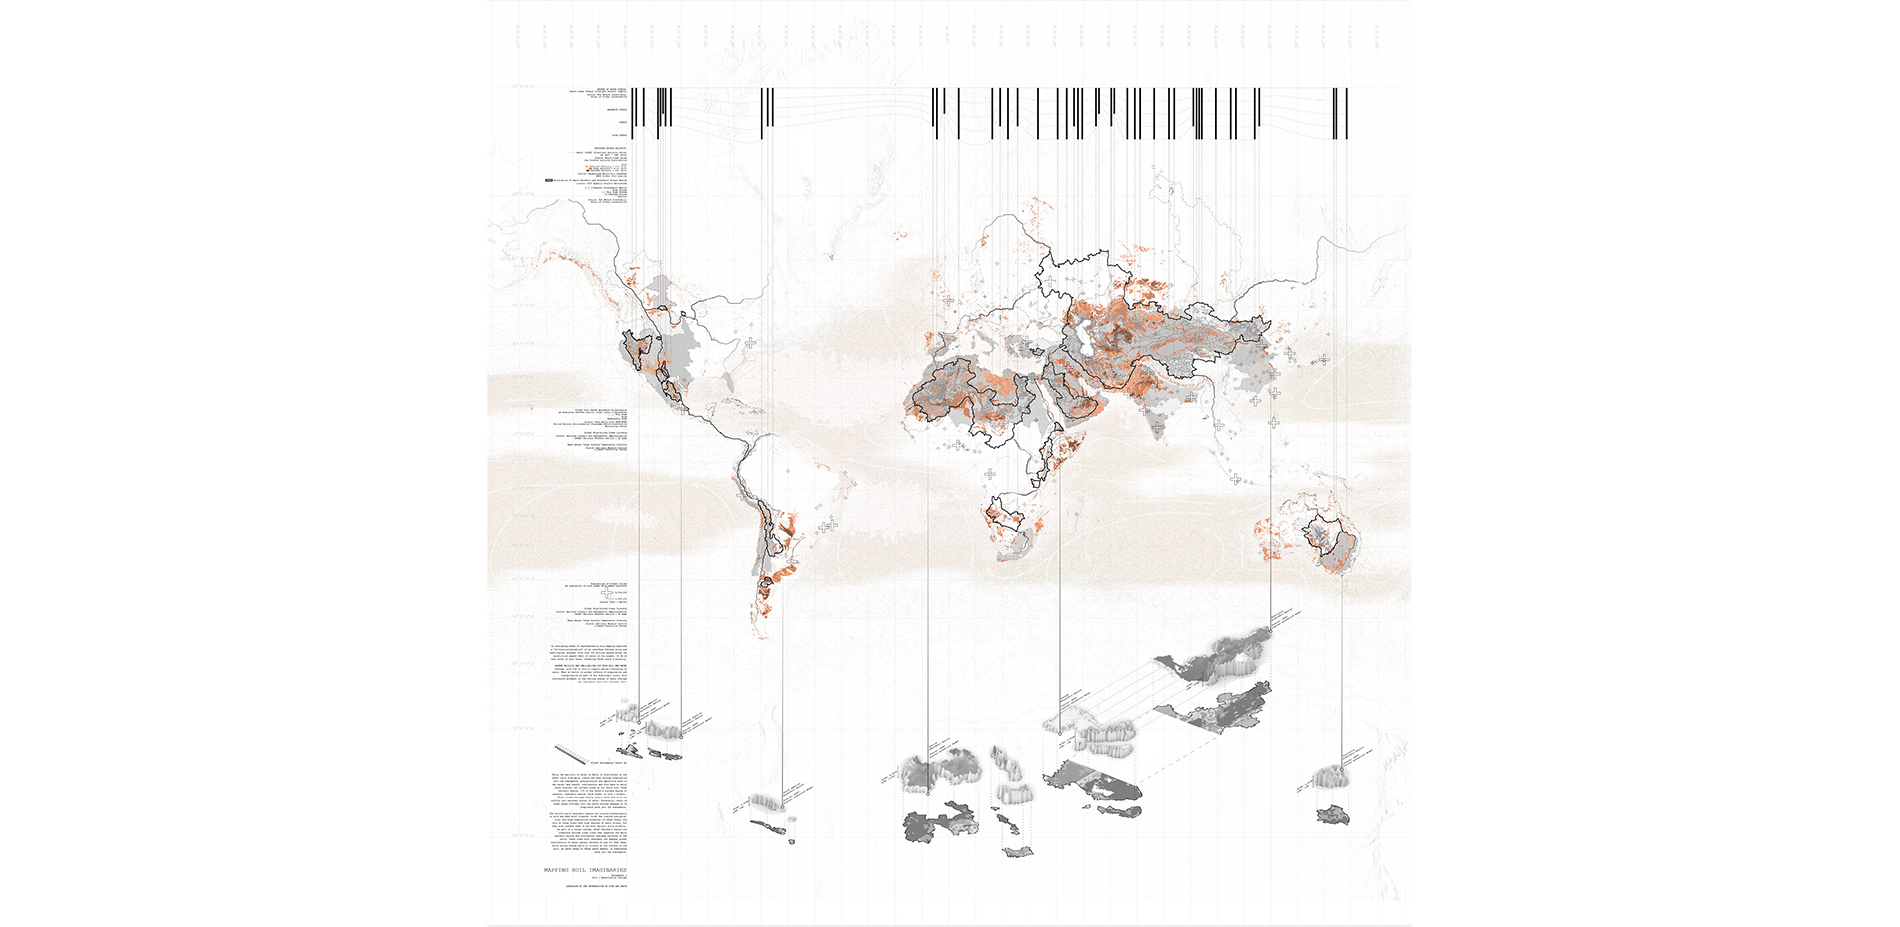 Mapping Soil Imaginaries: Global Endorheic Basins and Salinity